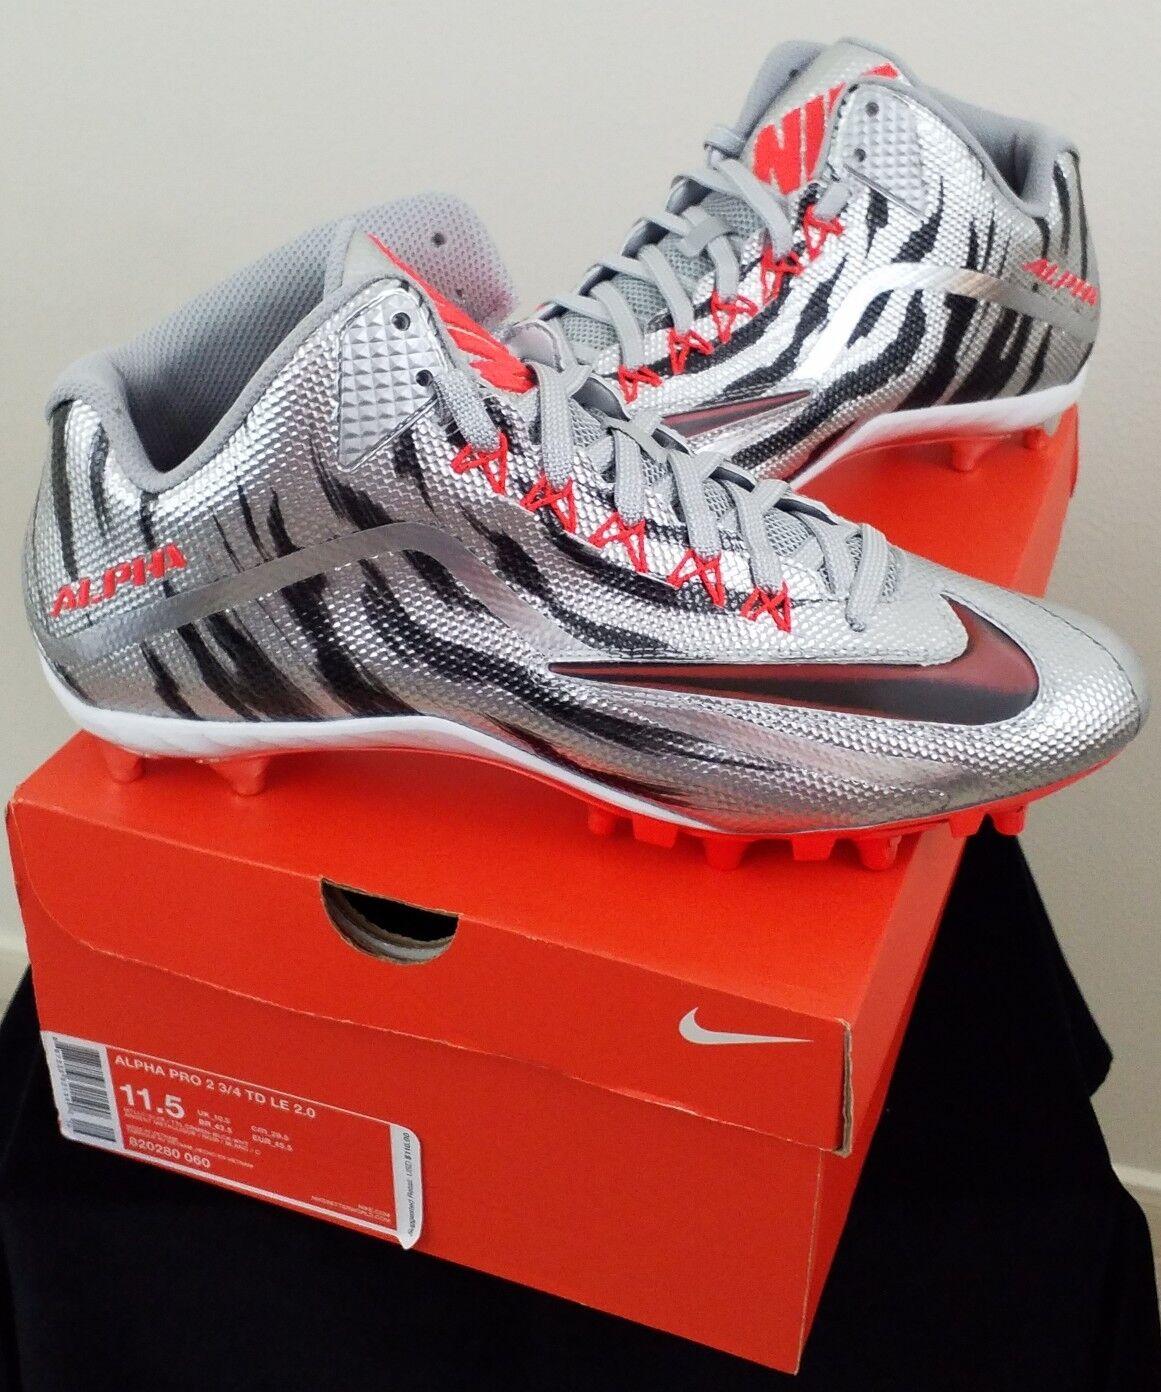 Nike Alpha Pro Pro Pro 2 3 4 TD LE 2.0 Metallic Silver Football Cleat 820280-060 Sz 11.5 f7aeaa